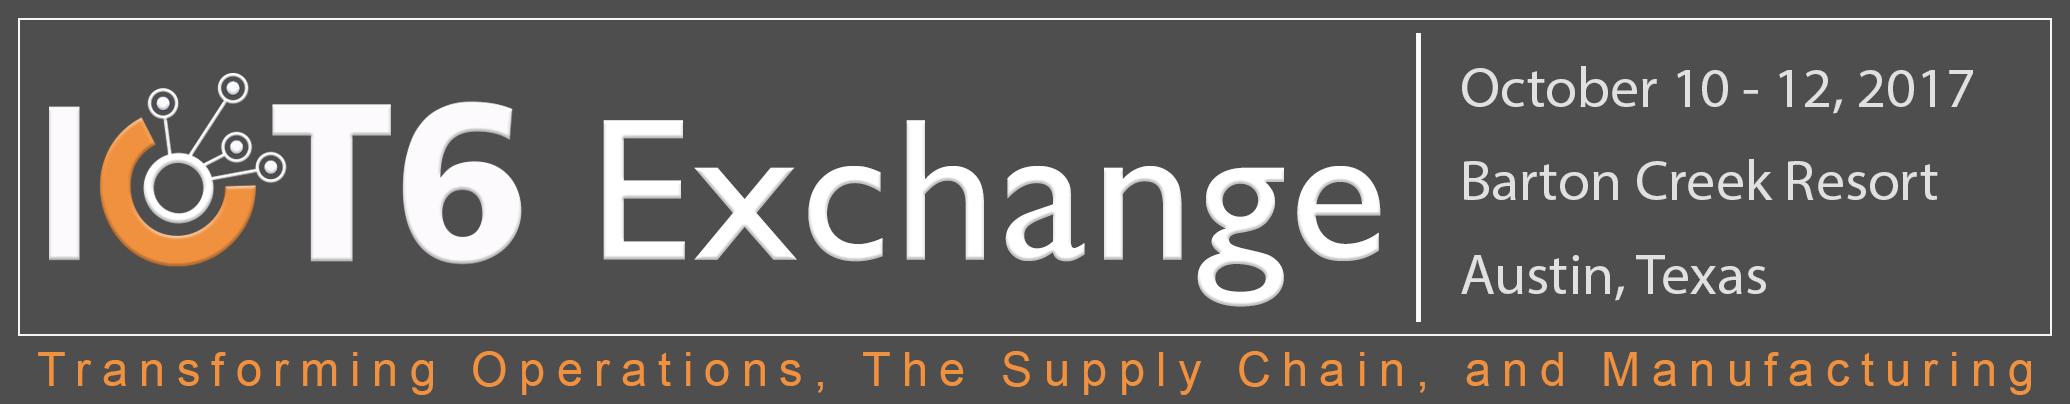 IoT6 Exchange - Dates on the Bottom (002)